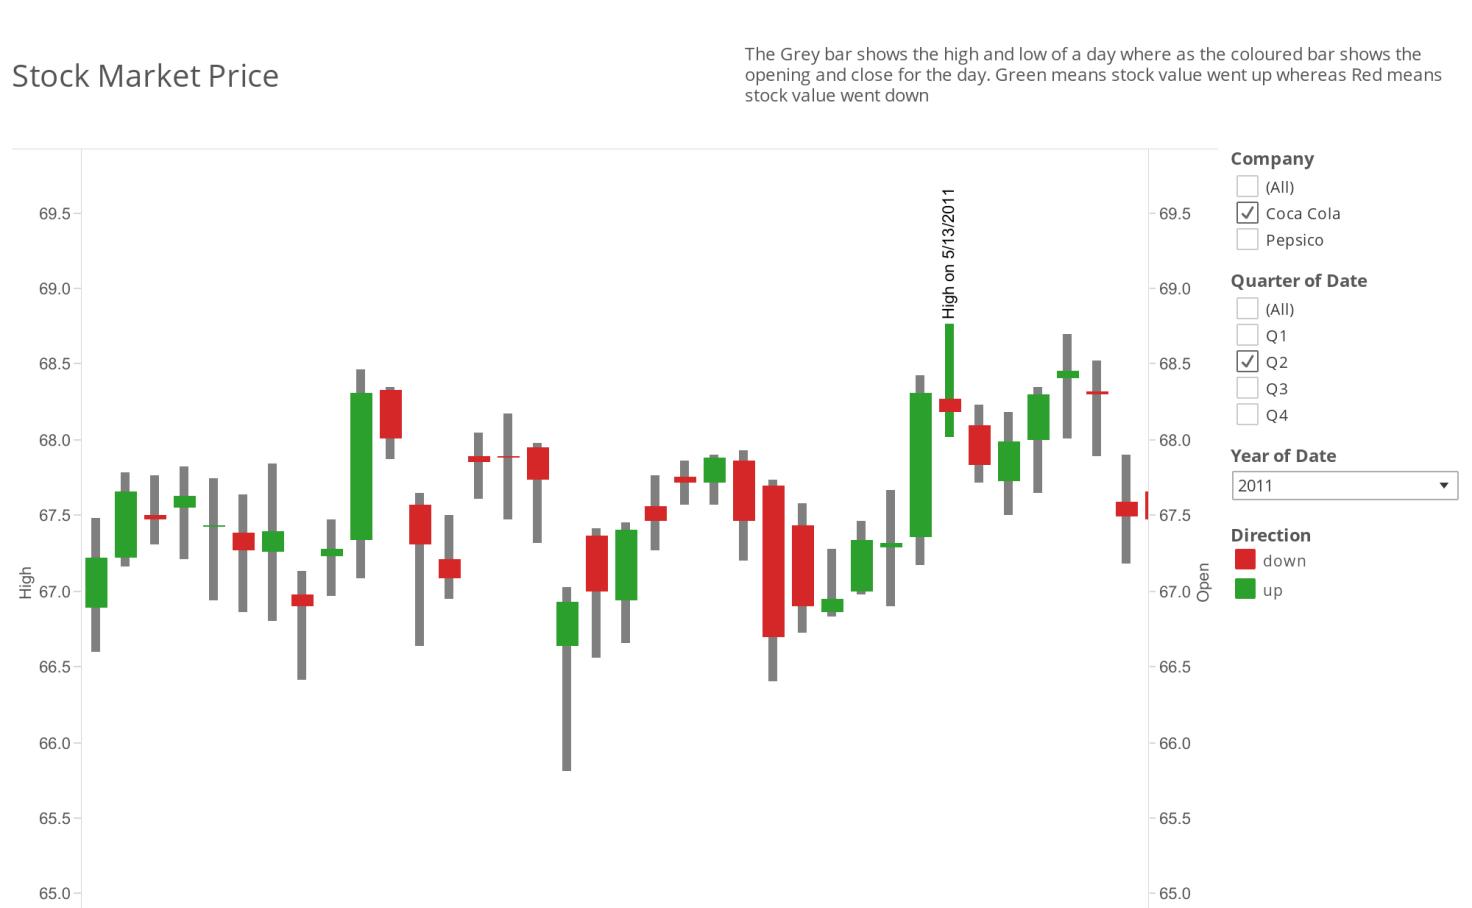 Stock Market Price - ayanangshu das   Tableau Public